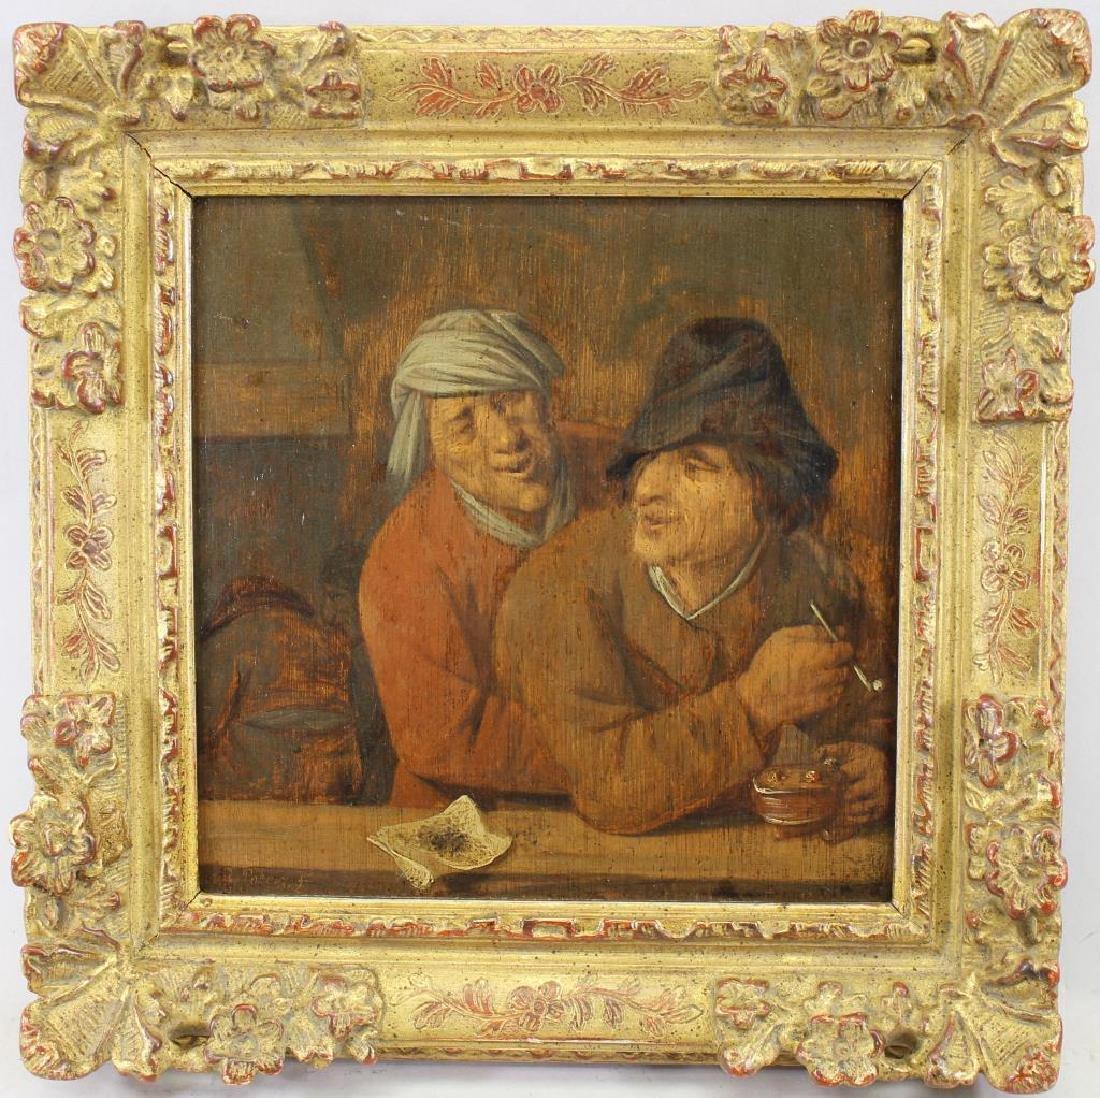 Pieter Symonsz Potter (Holland, 1597 - 1652)